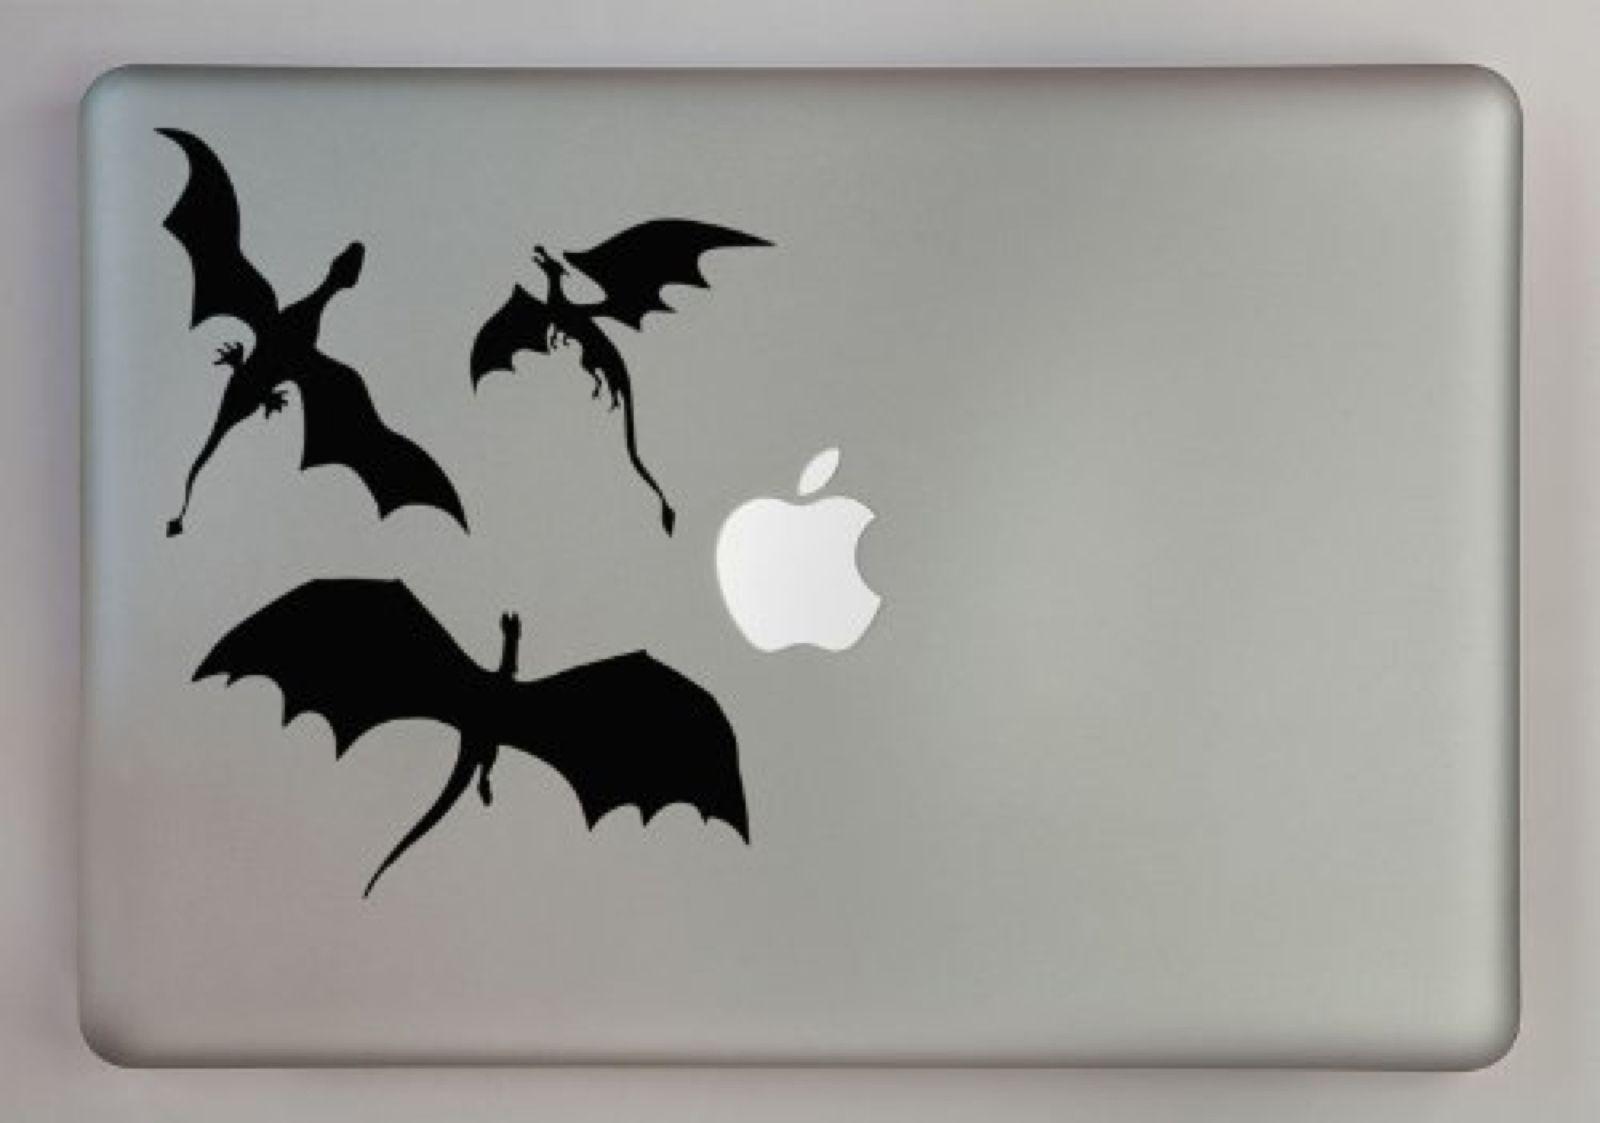 4 4 Aud Dragons From Got Decal For Mac And Cars Black Vinyl Decals Australia Made Ebay Electronics Stickers Tatuagem Tatoo